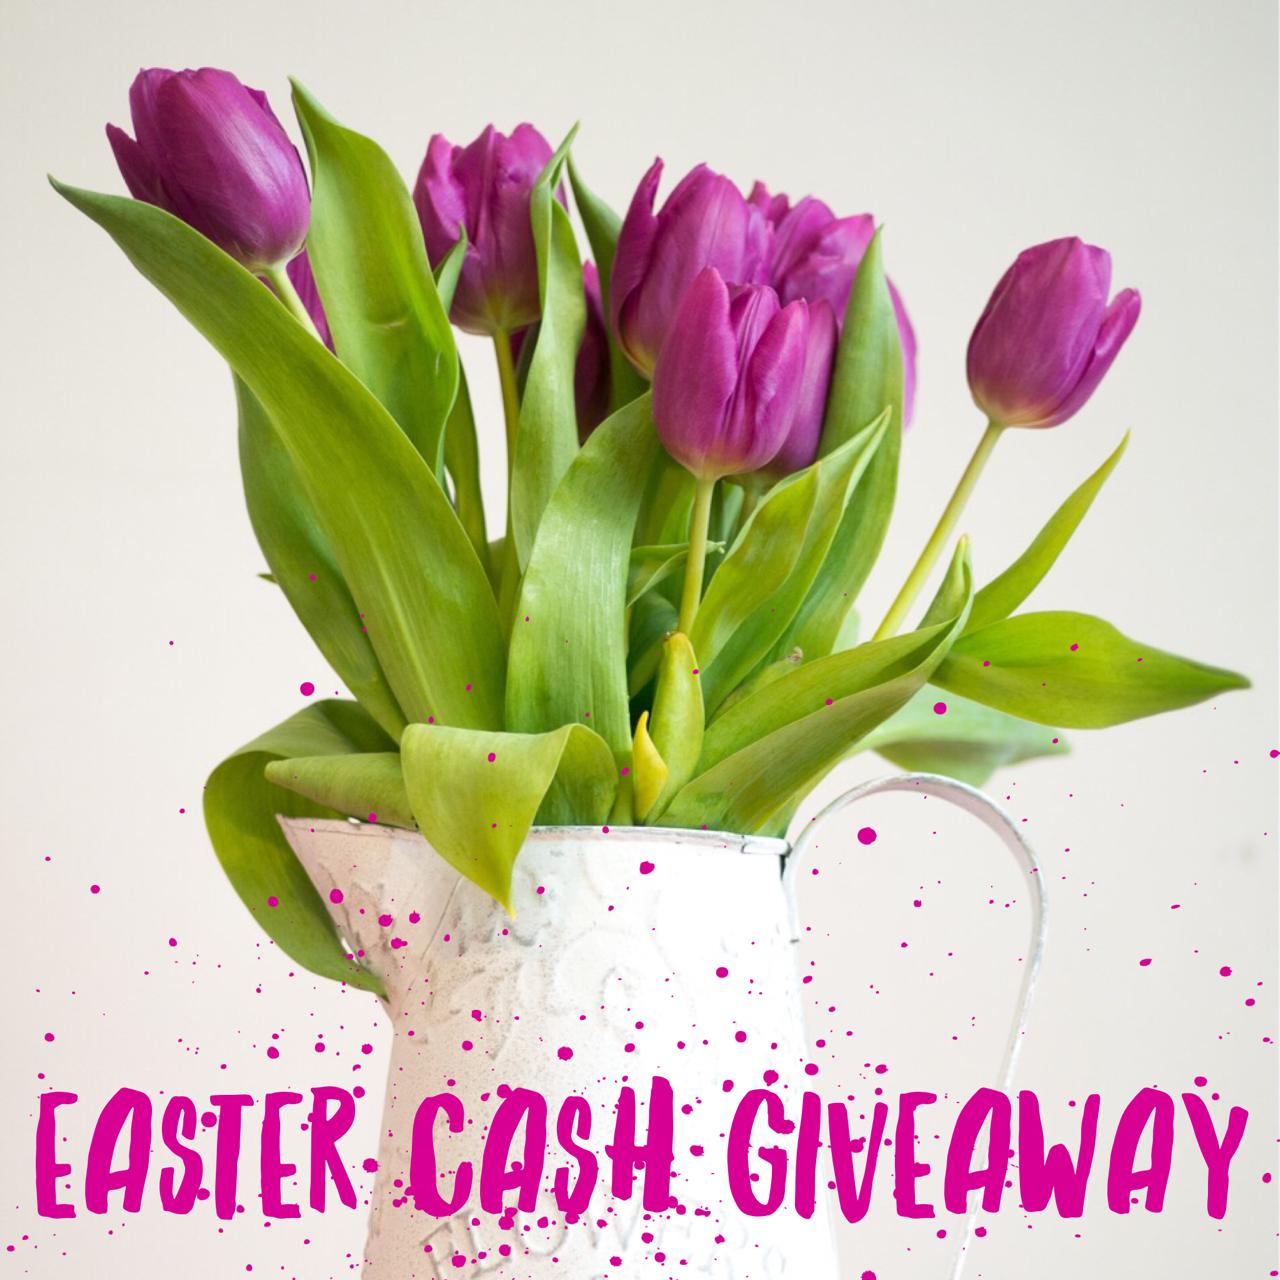 Easter Cash Giveaway